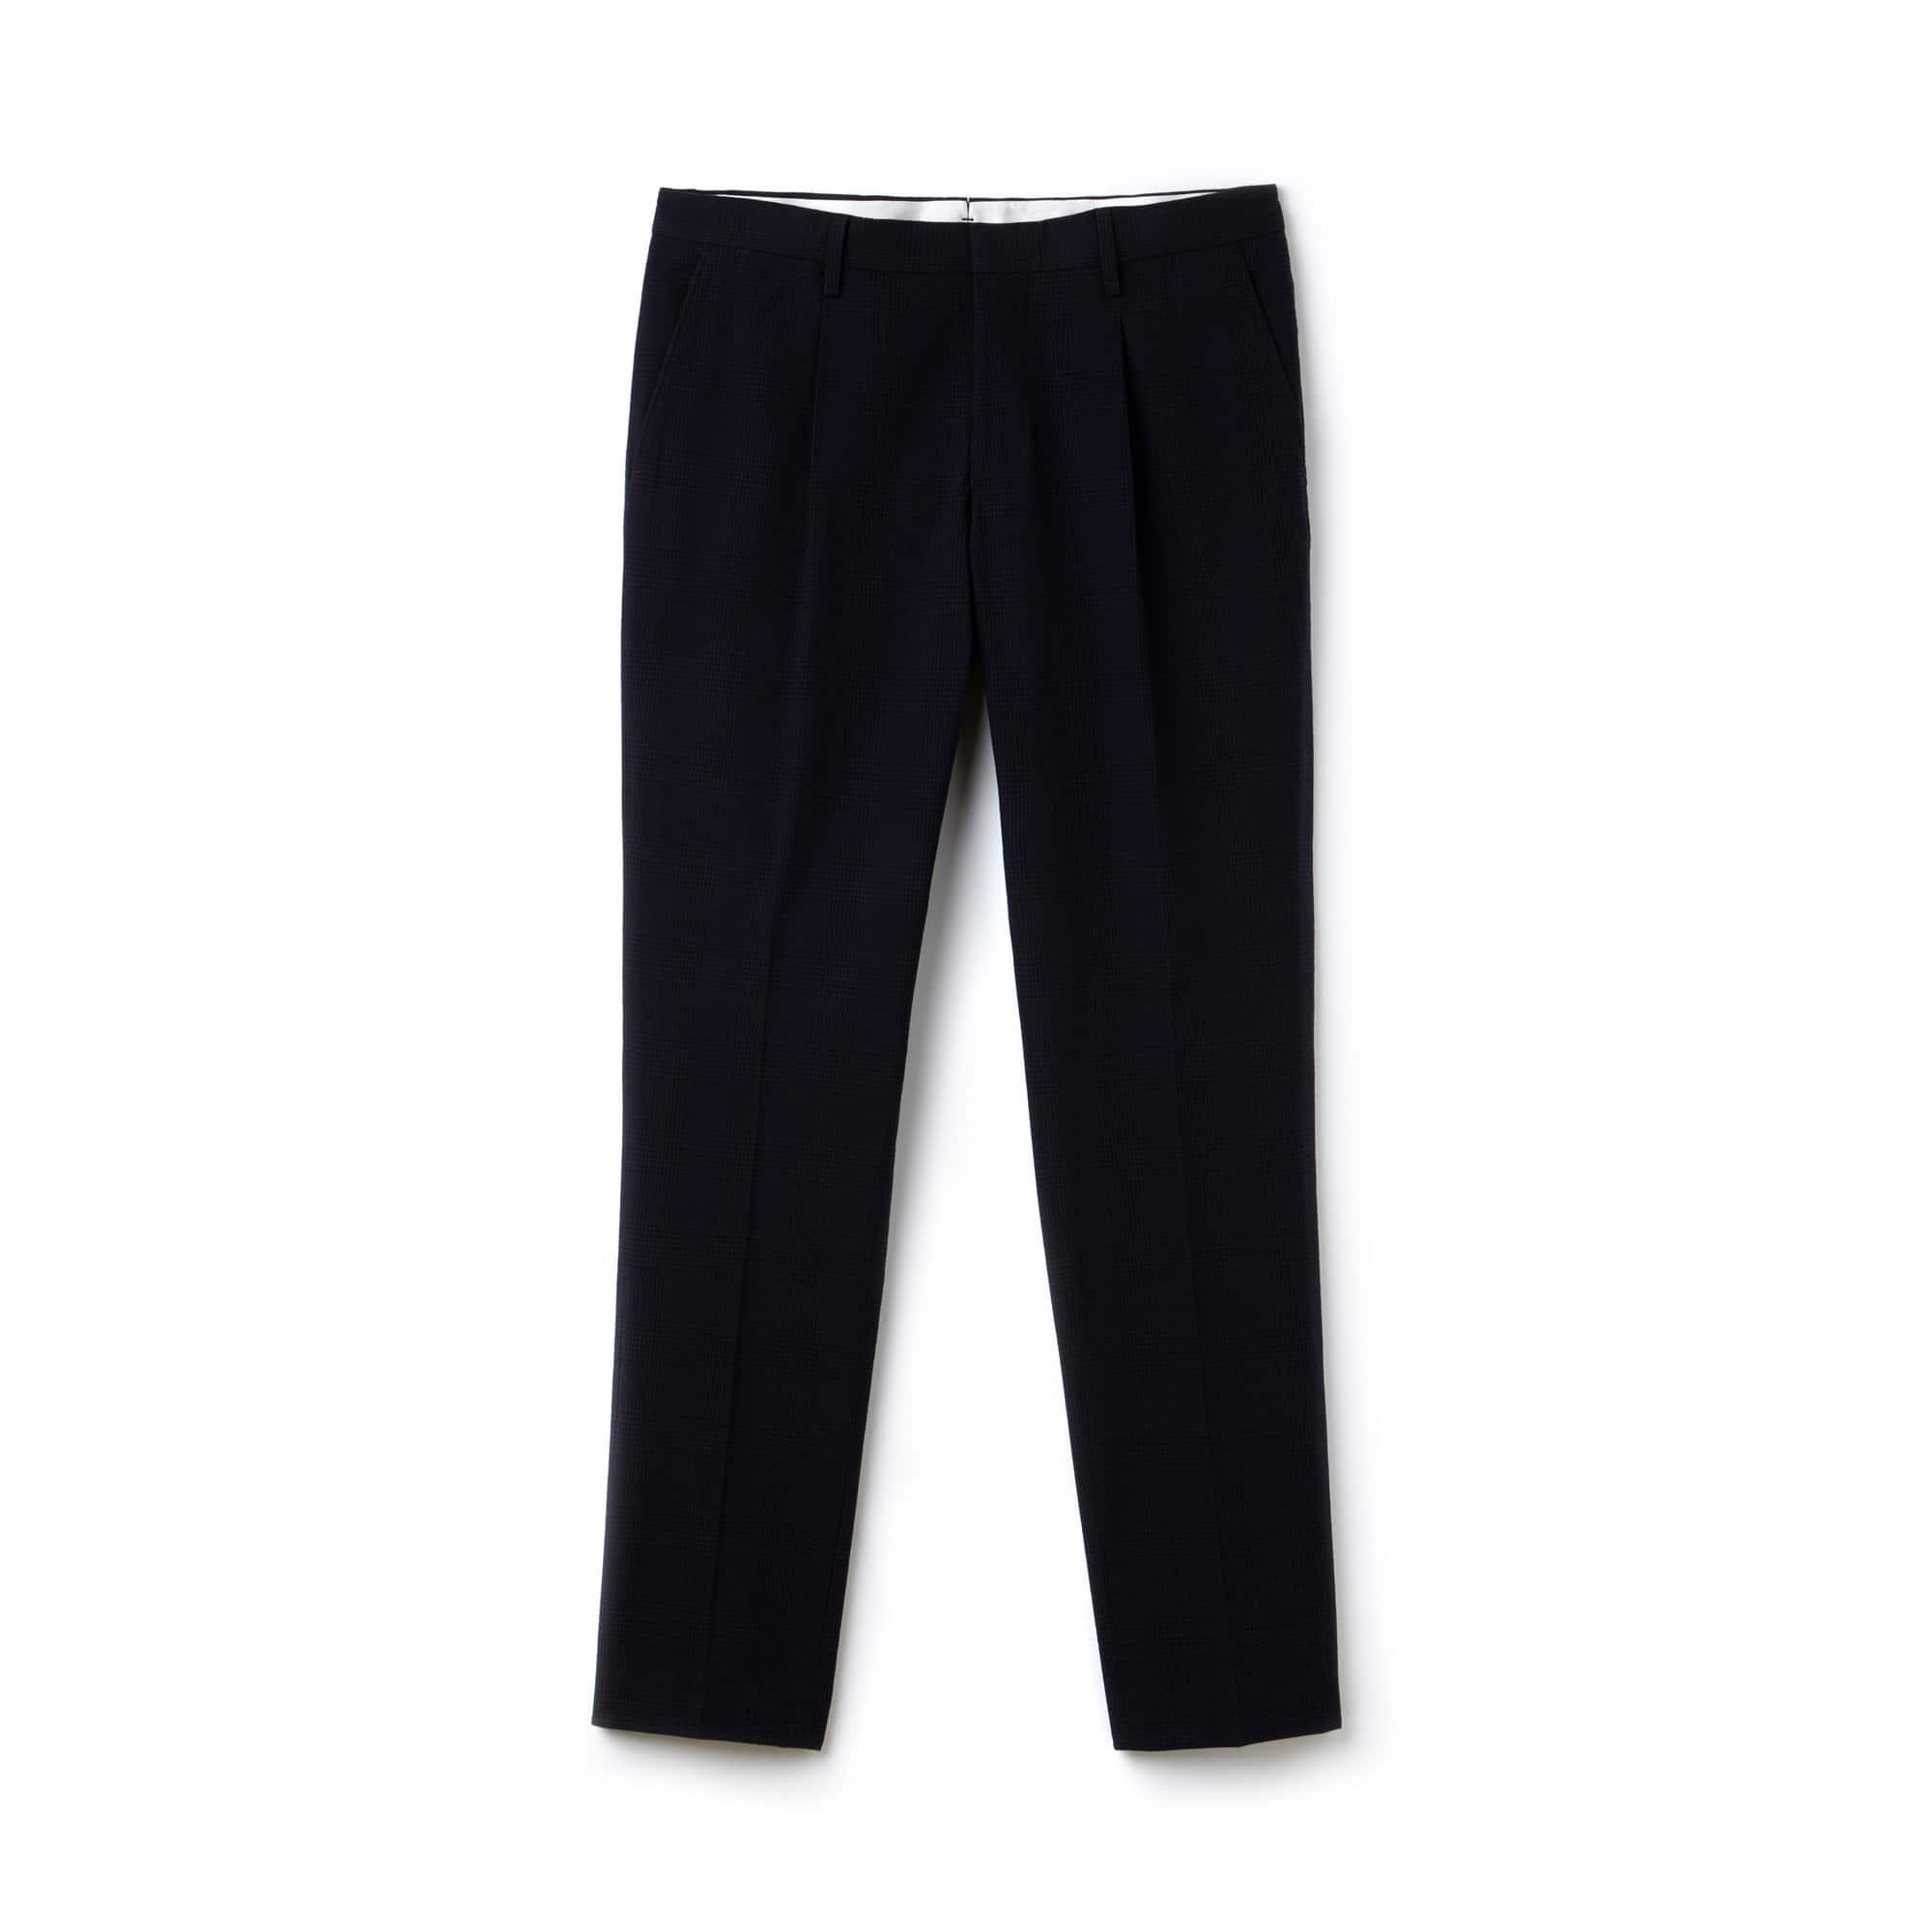 Men's Slim Fit Check Seersucker Pleated Chino Pants